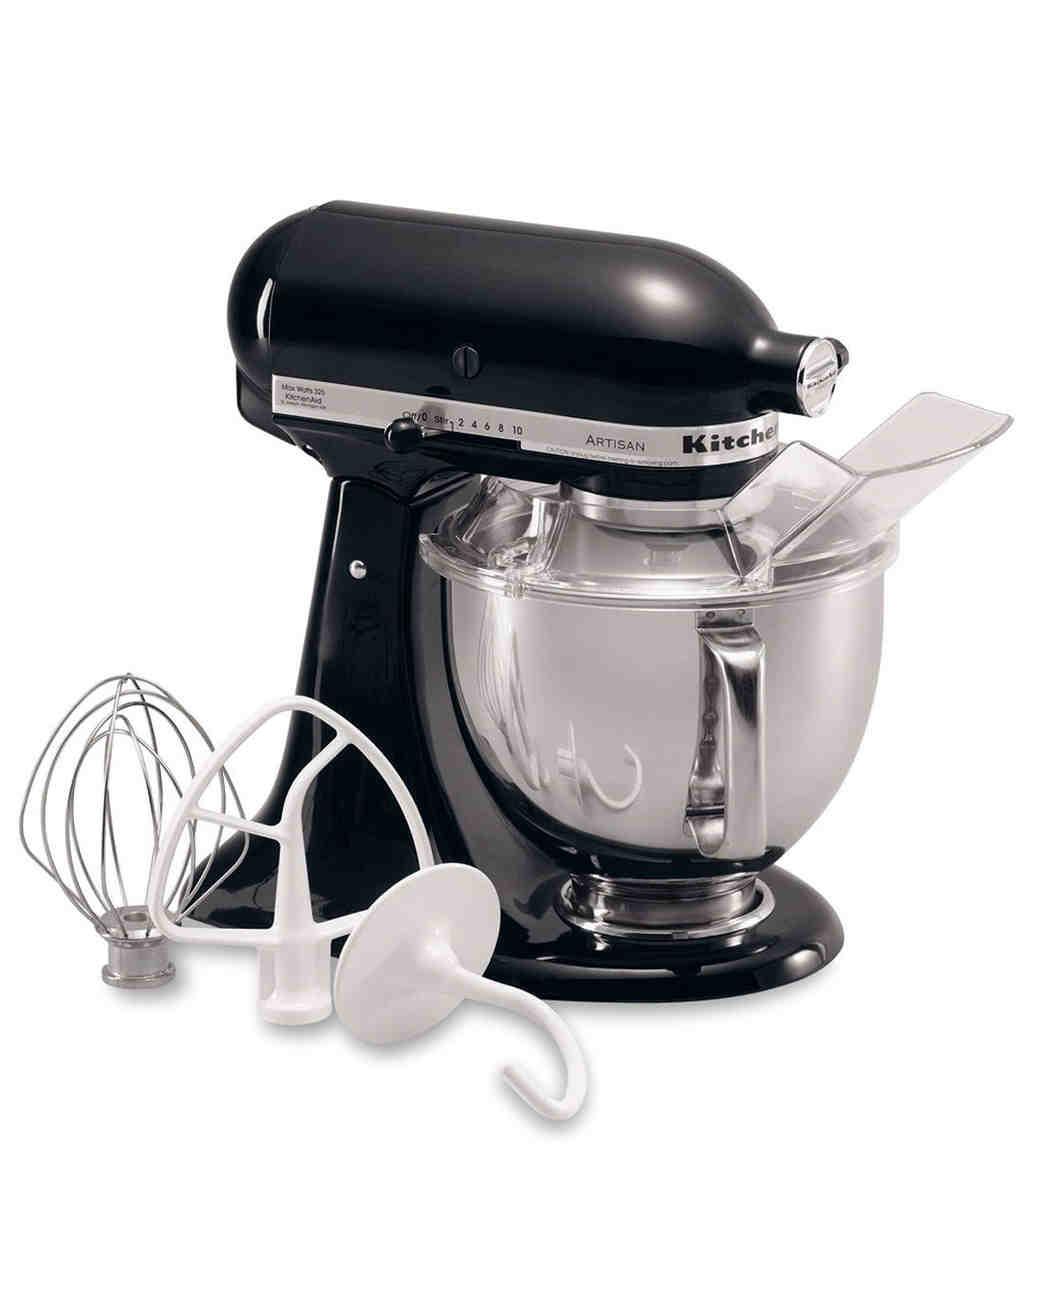 black-kitchenaid-mixer-1015.jpg